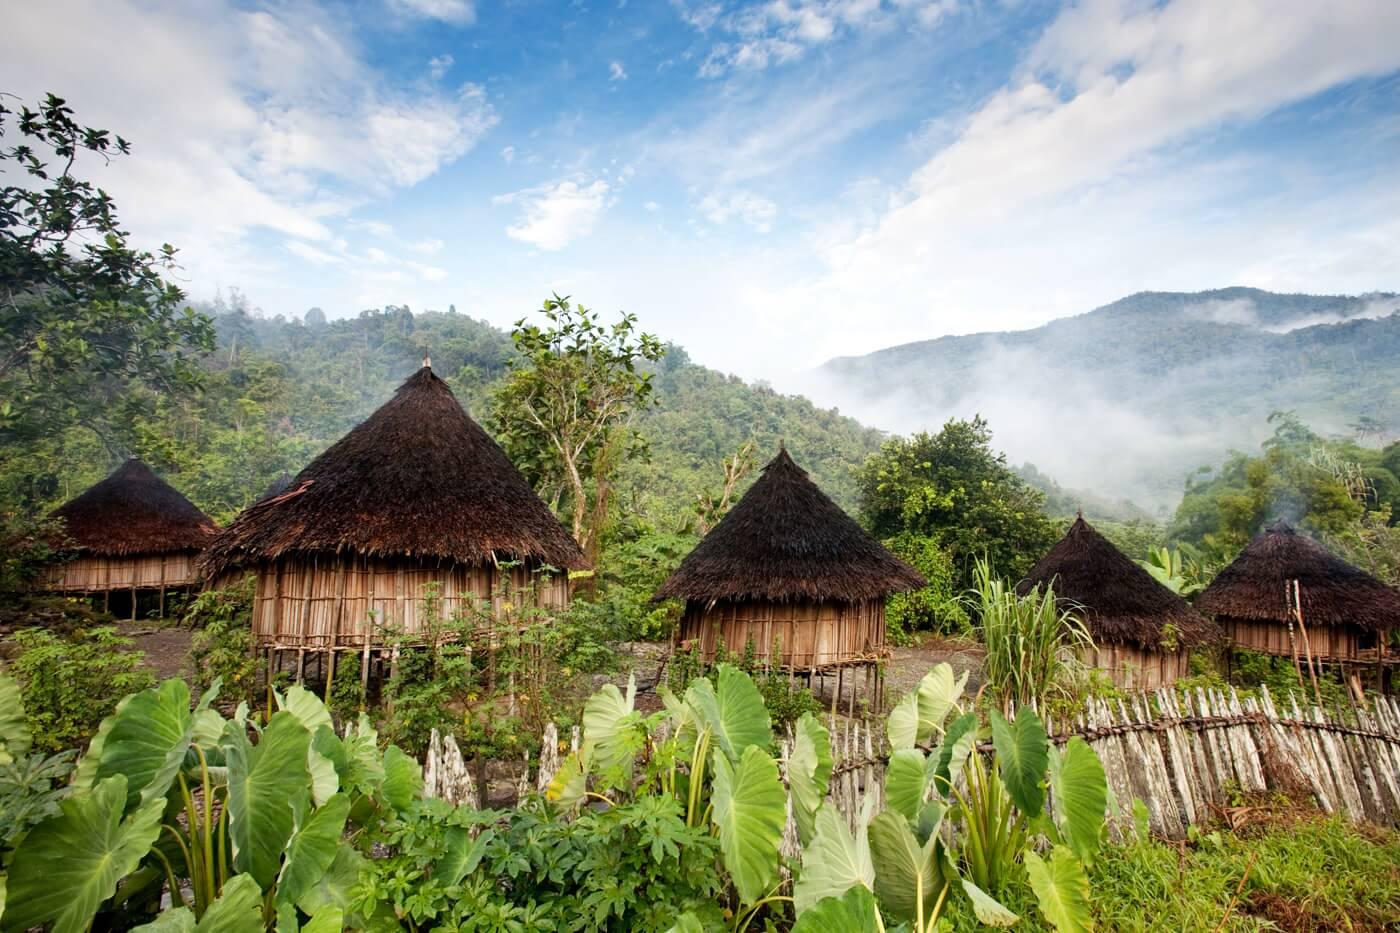 vanille-de-papouasie-village